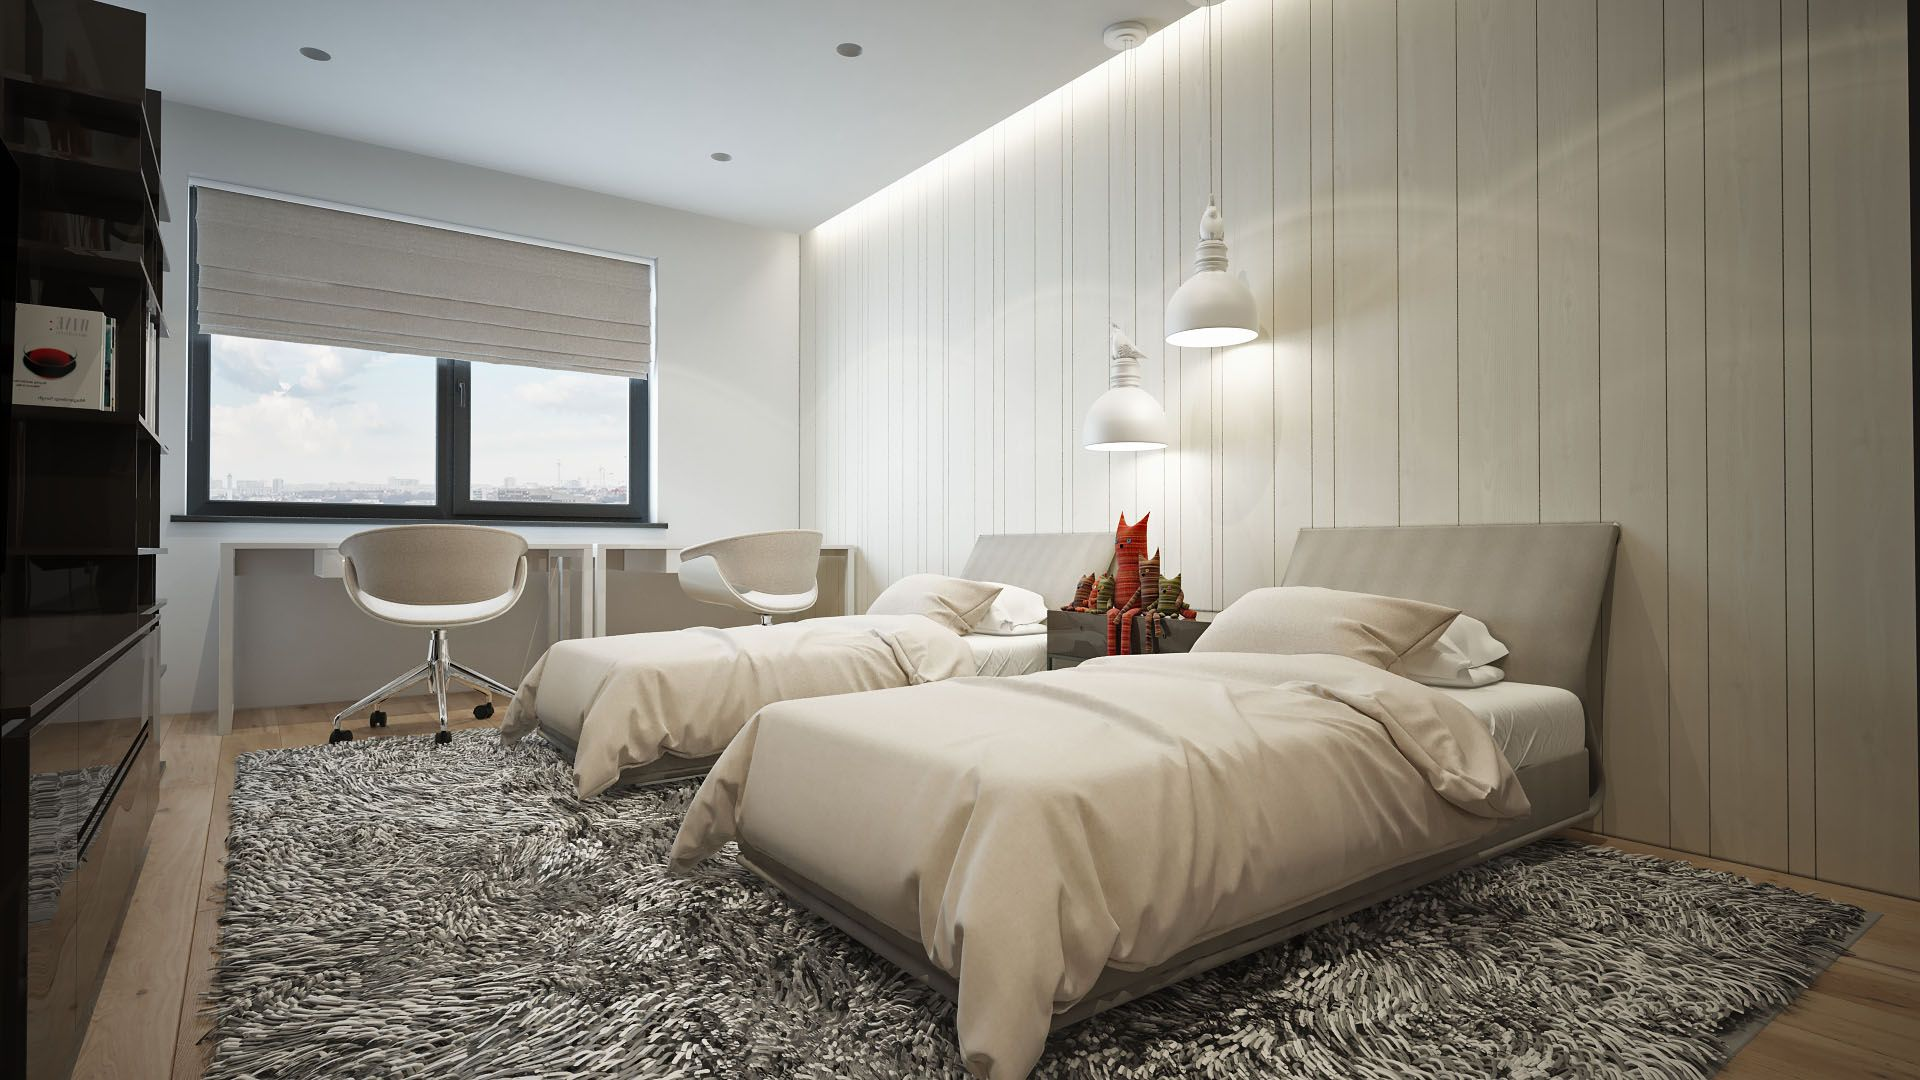 creativeguestroomdesign  Bedrooms  Guest room House design Home interior design